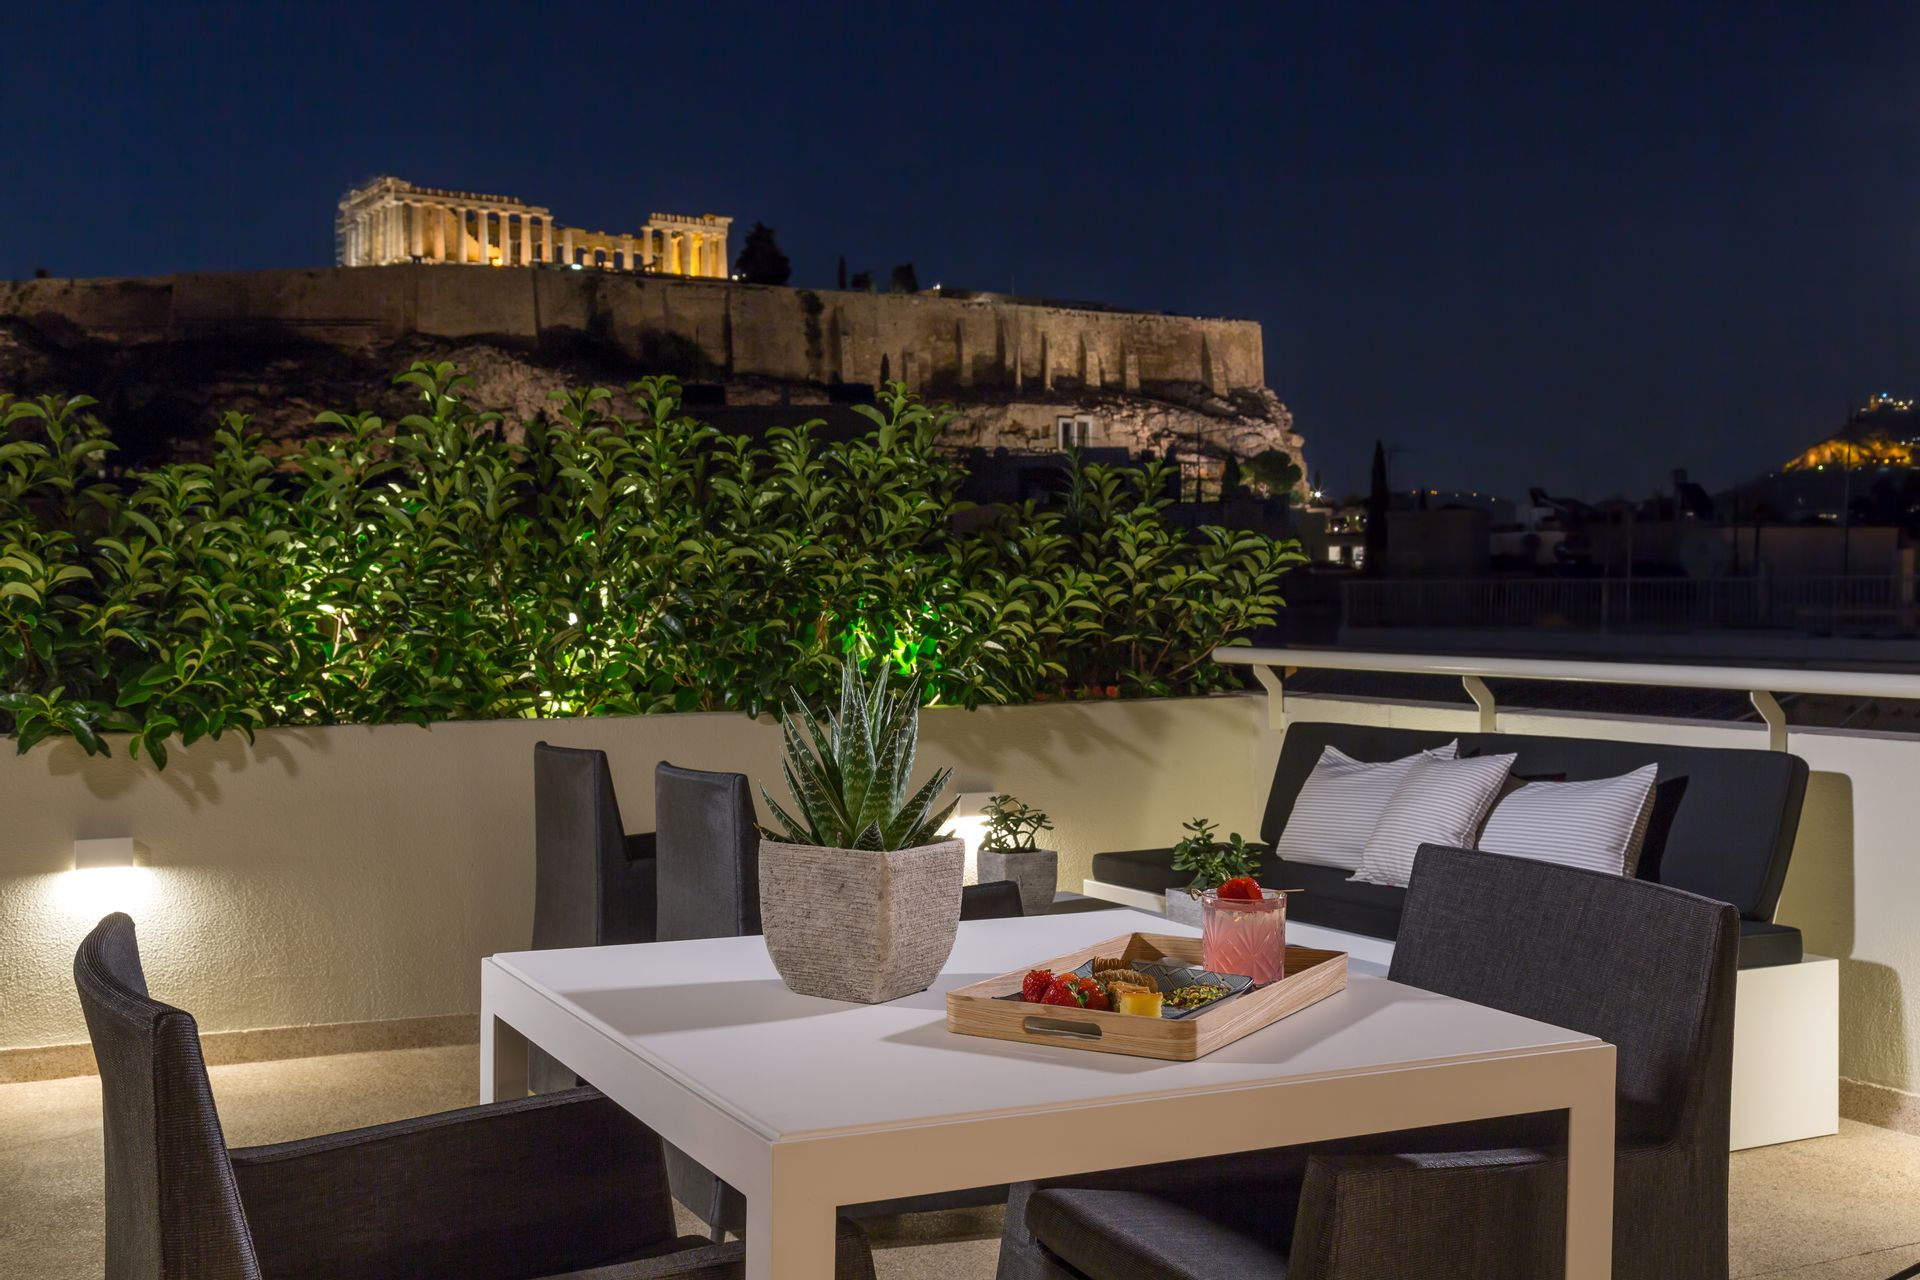 Divani Palace Acropolis - Offers - Eat Sleep Staycation Retreat